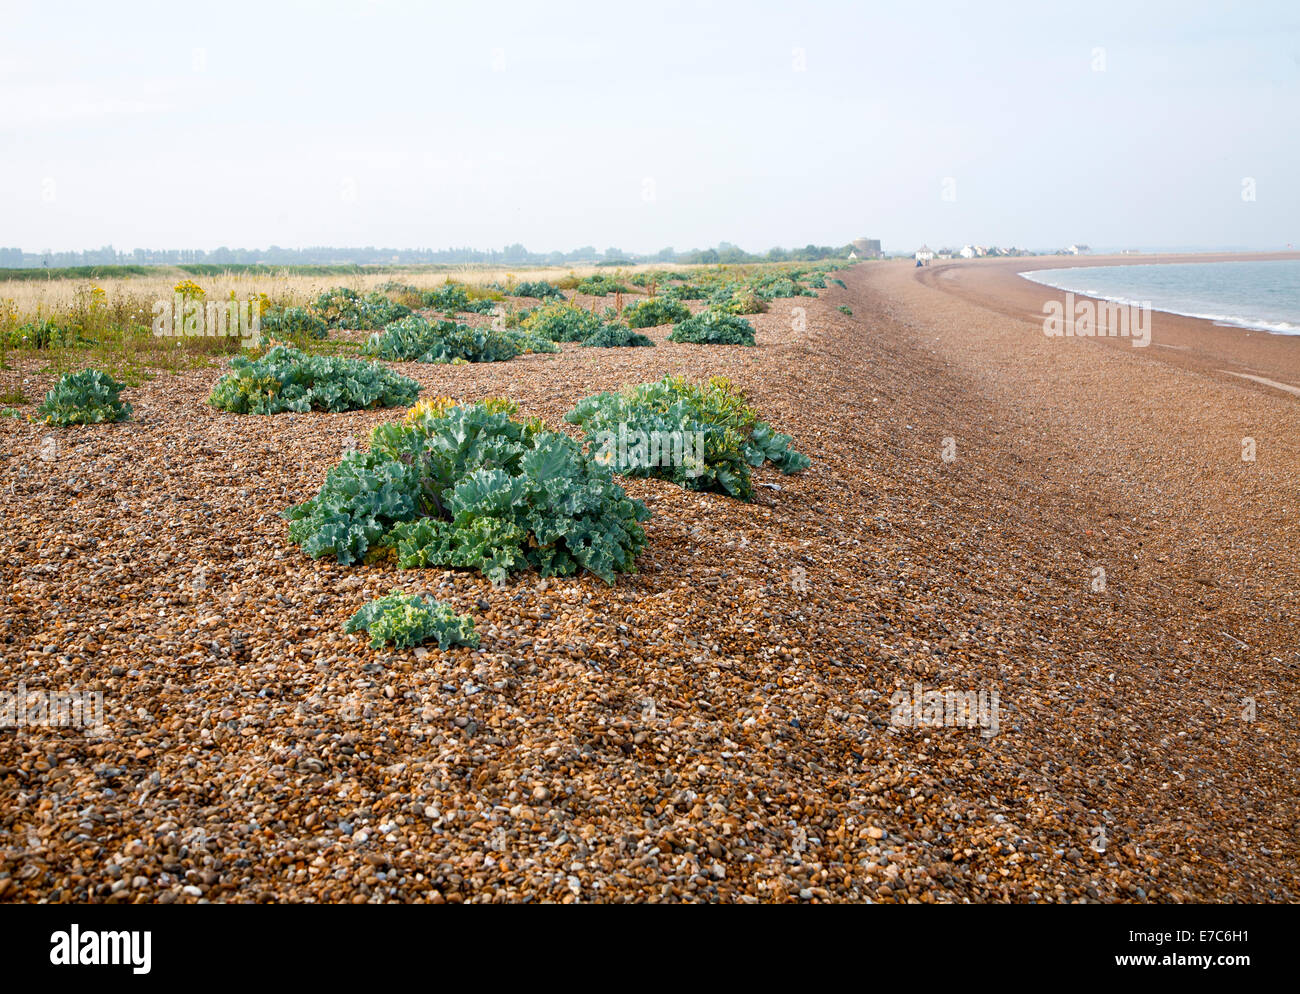 Vegetated shingle ecosystem with sea kale, Crambe maritime, growing at Shingle Street, Suffolk, England - Stock Image